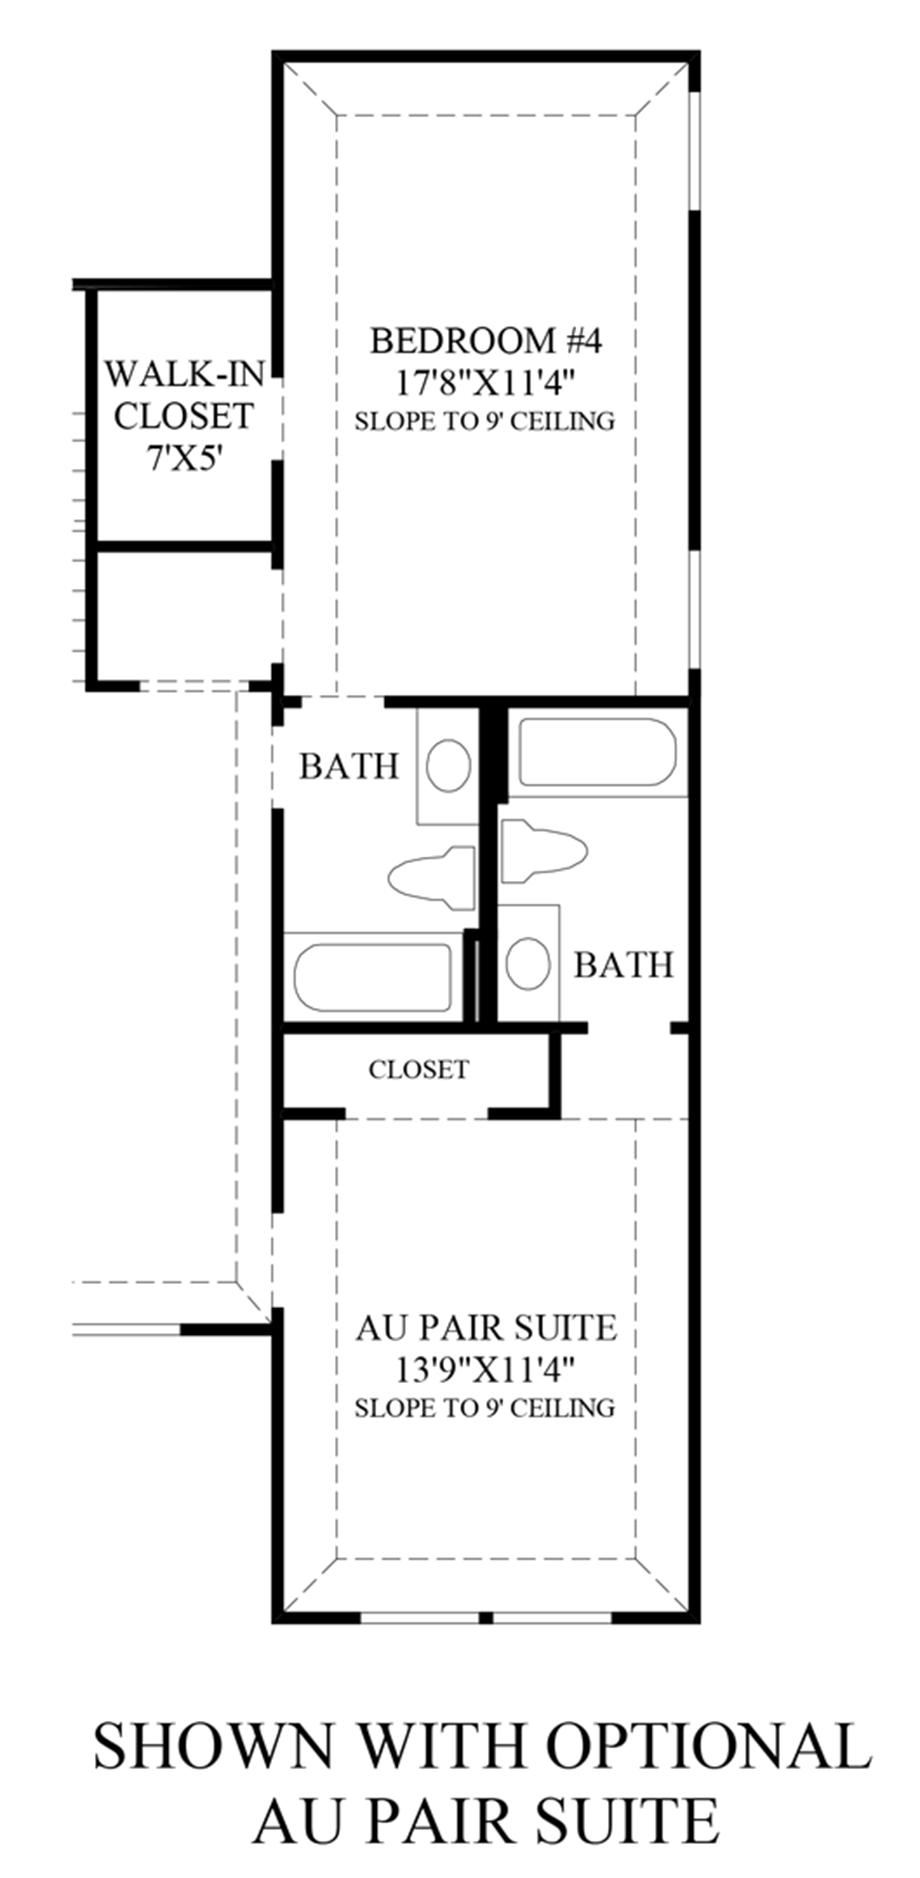 Optional Au Pair Suite Floor Plan